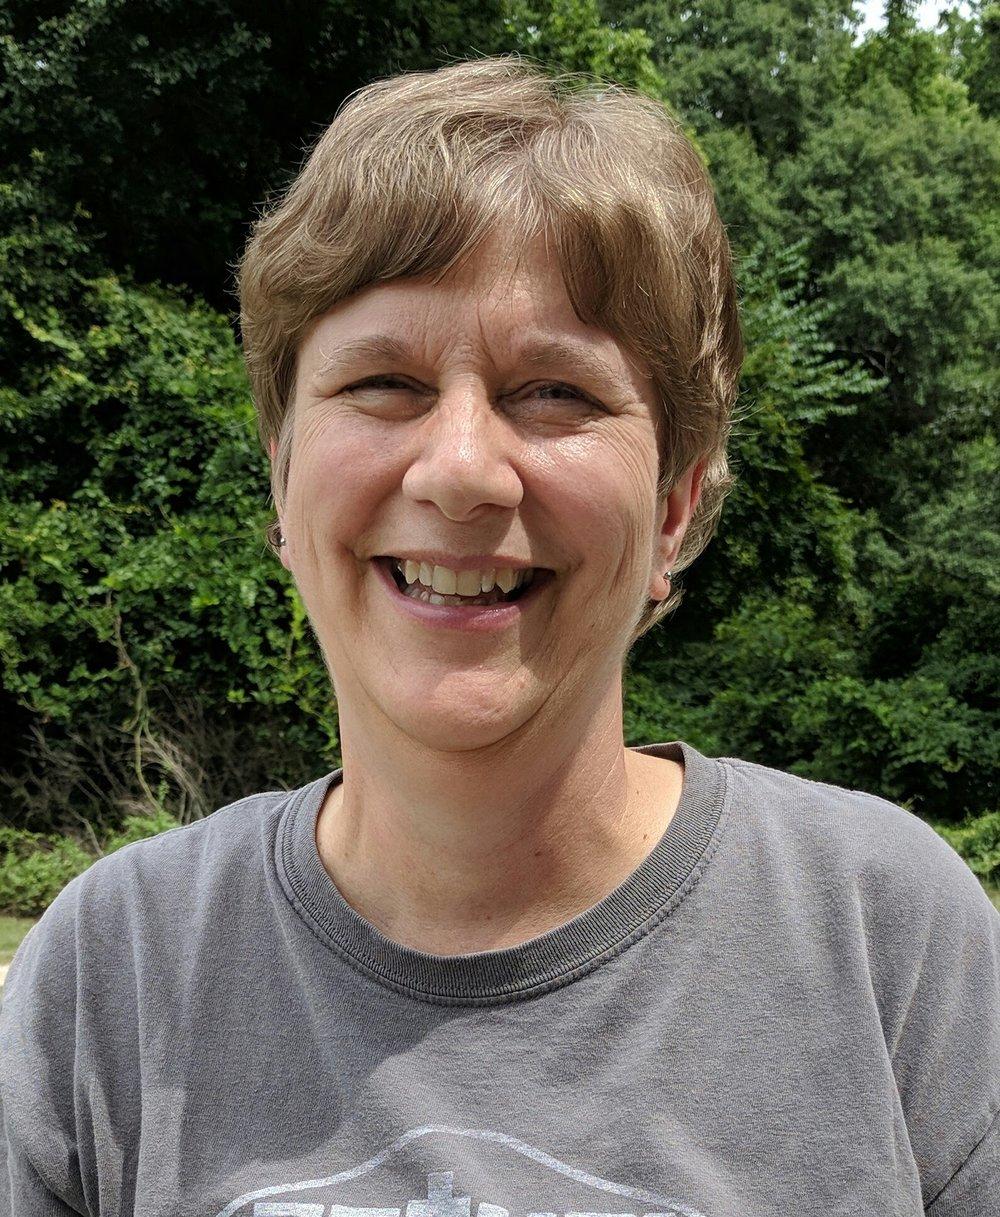 Dr. Karen Grant